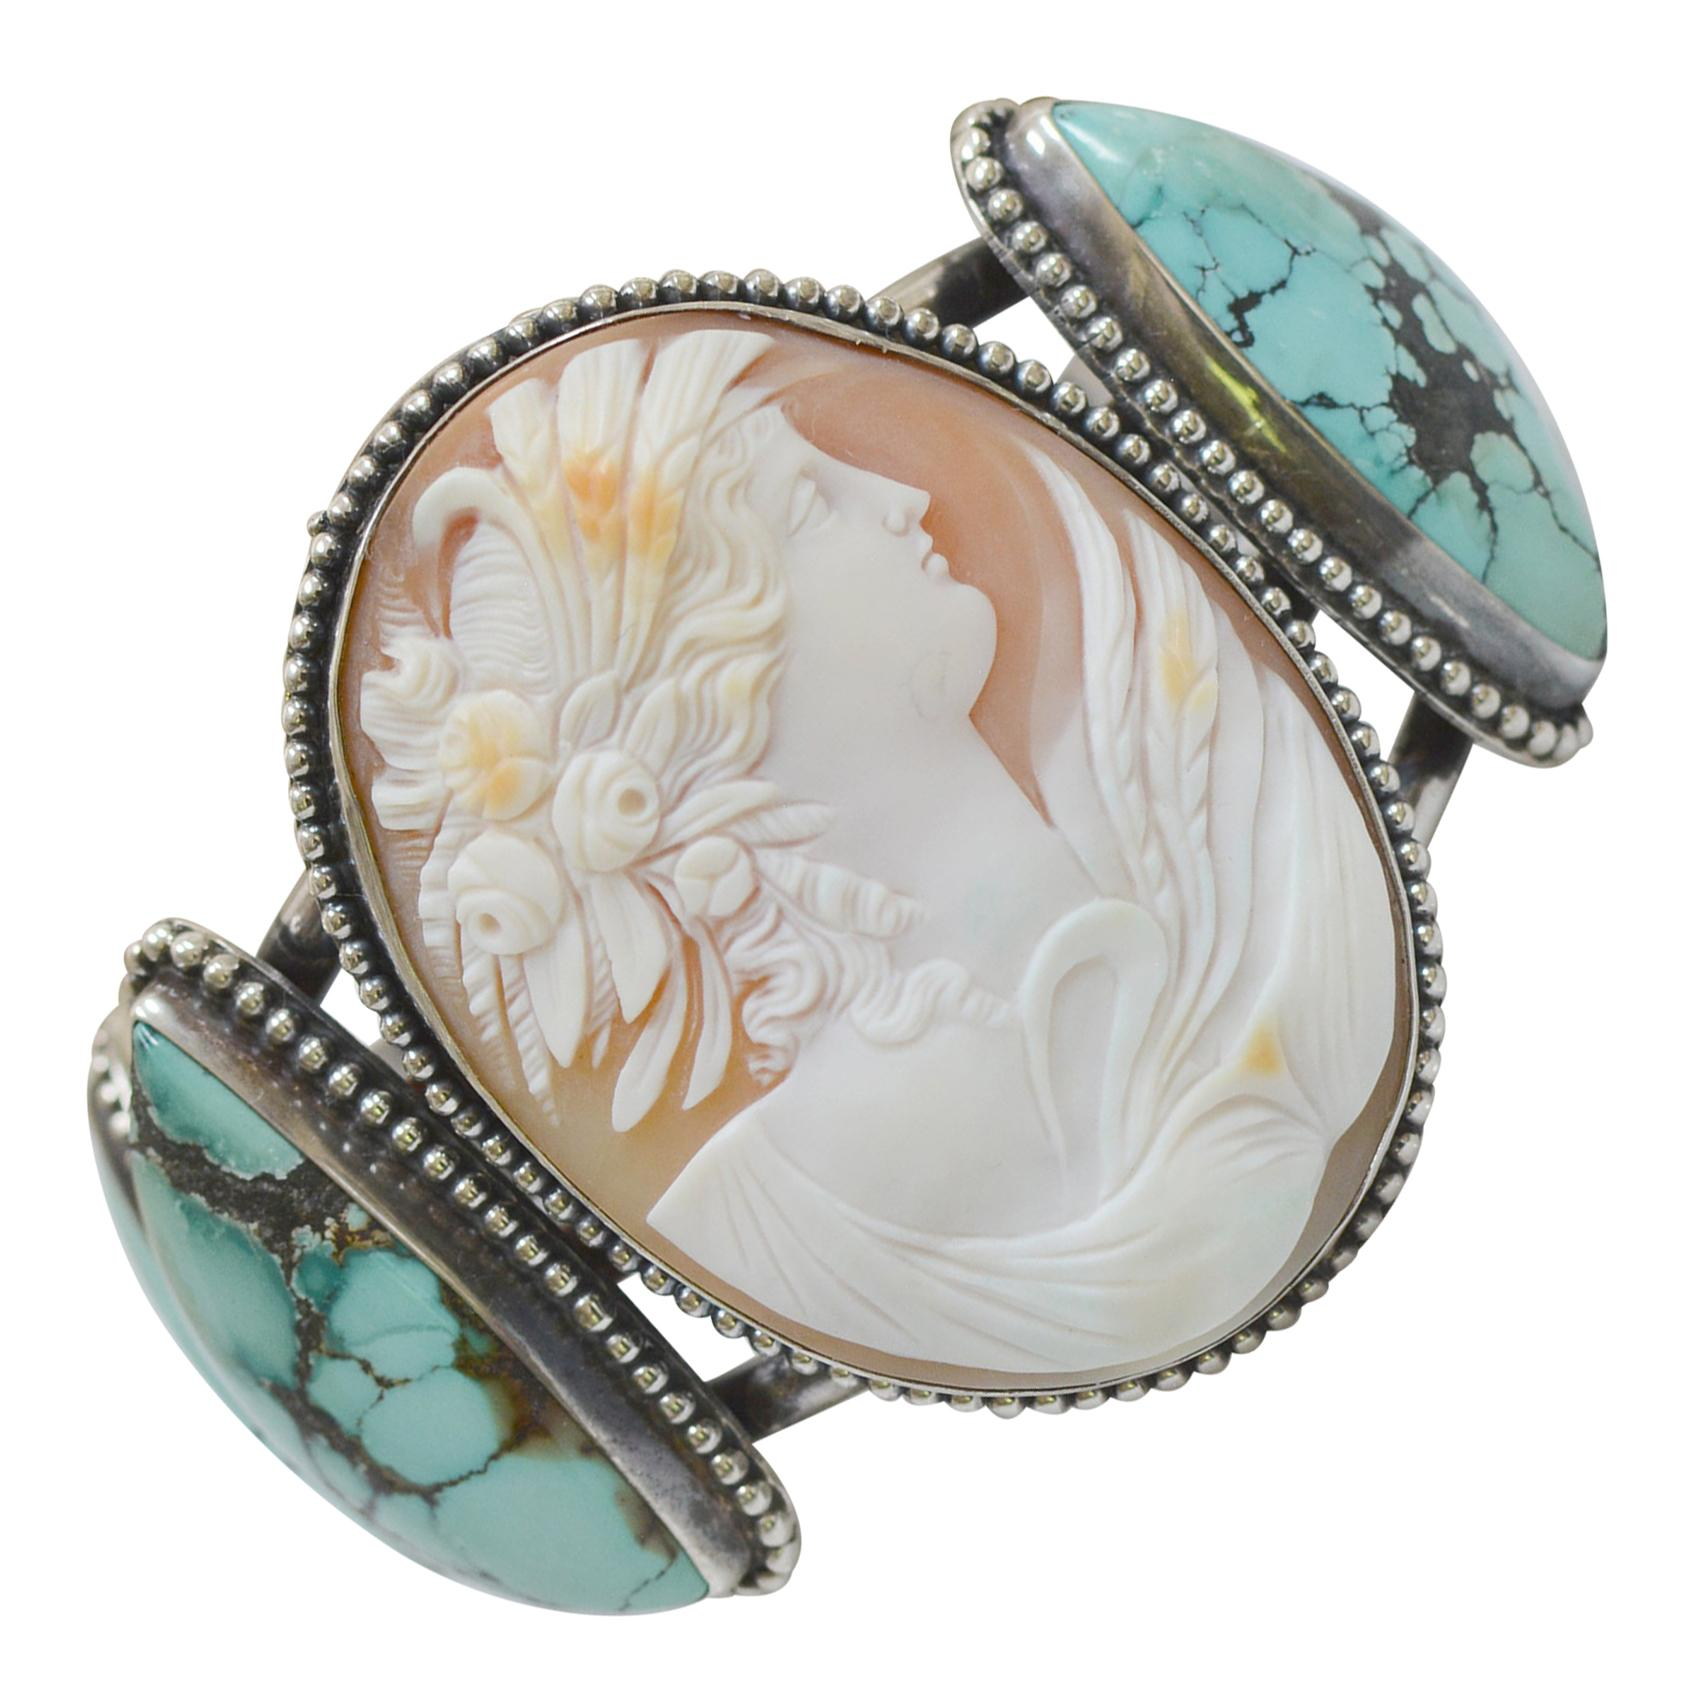 Jill Garber Antique Cameo Cuff Bracelet Depicting Goddess Leda with Turquoise